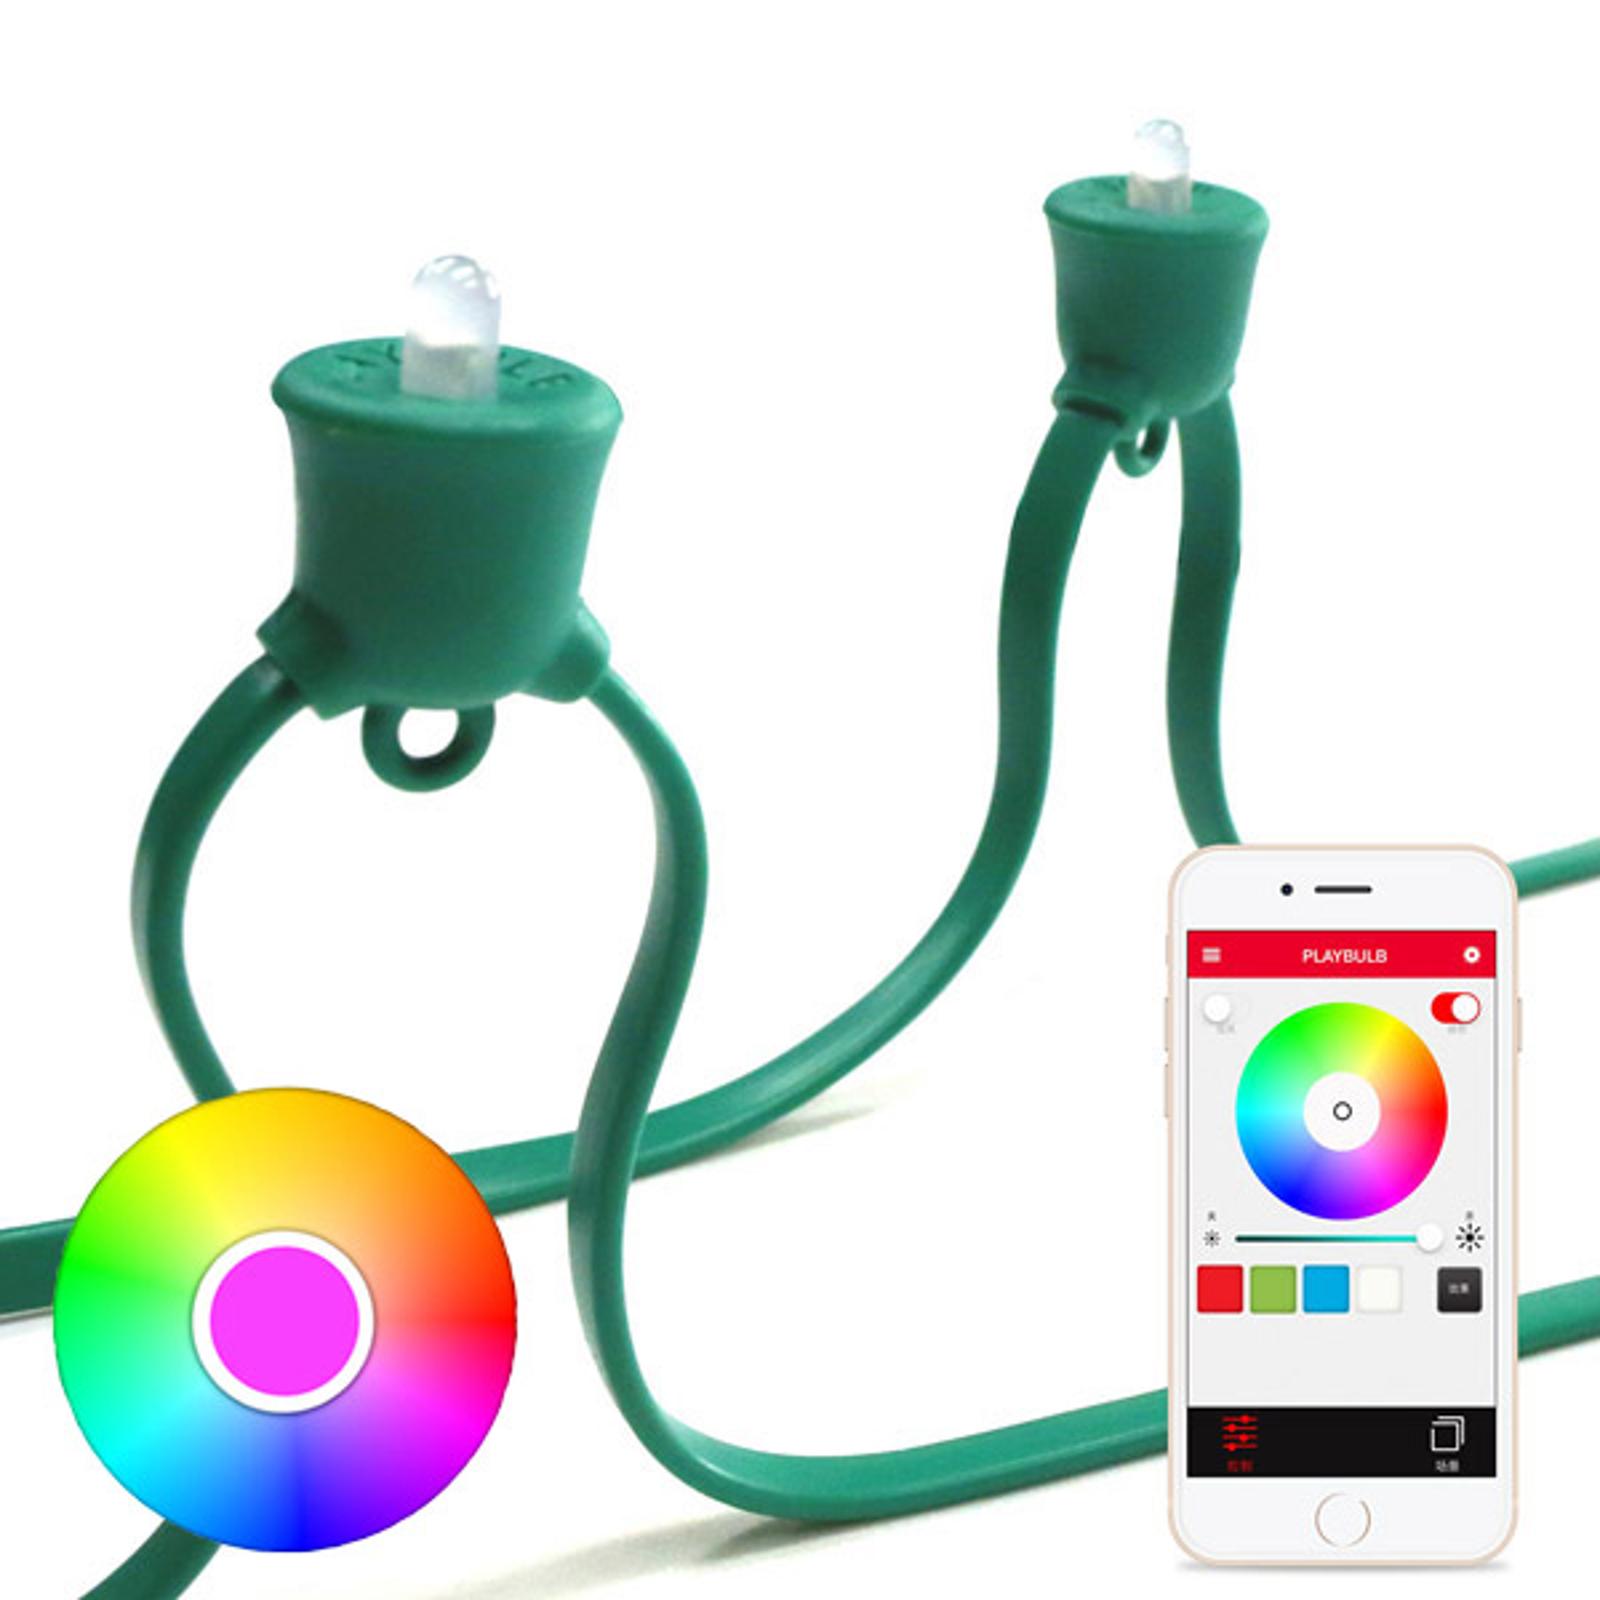 MiPow Playbulb String extensión LED, 5 m, verde